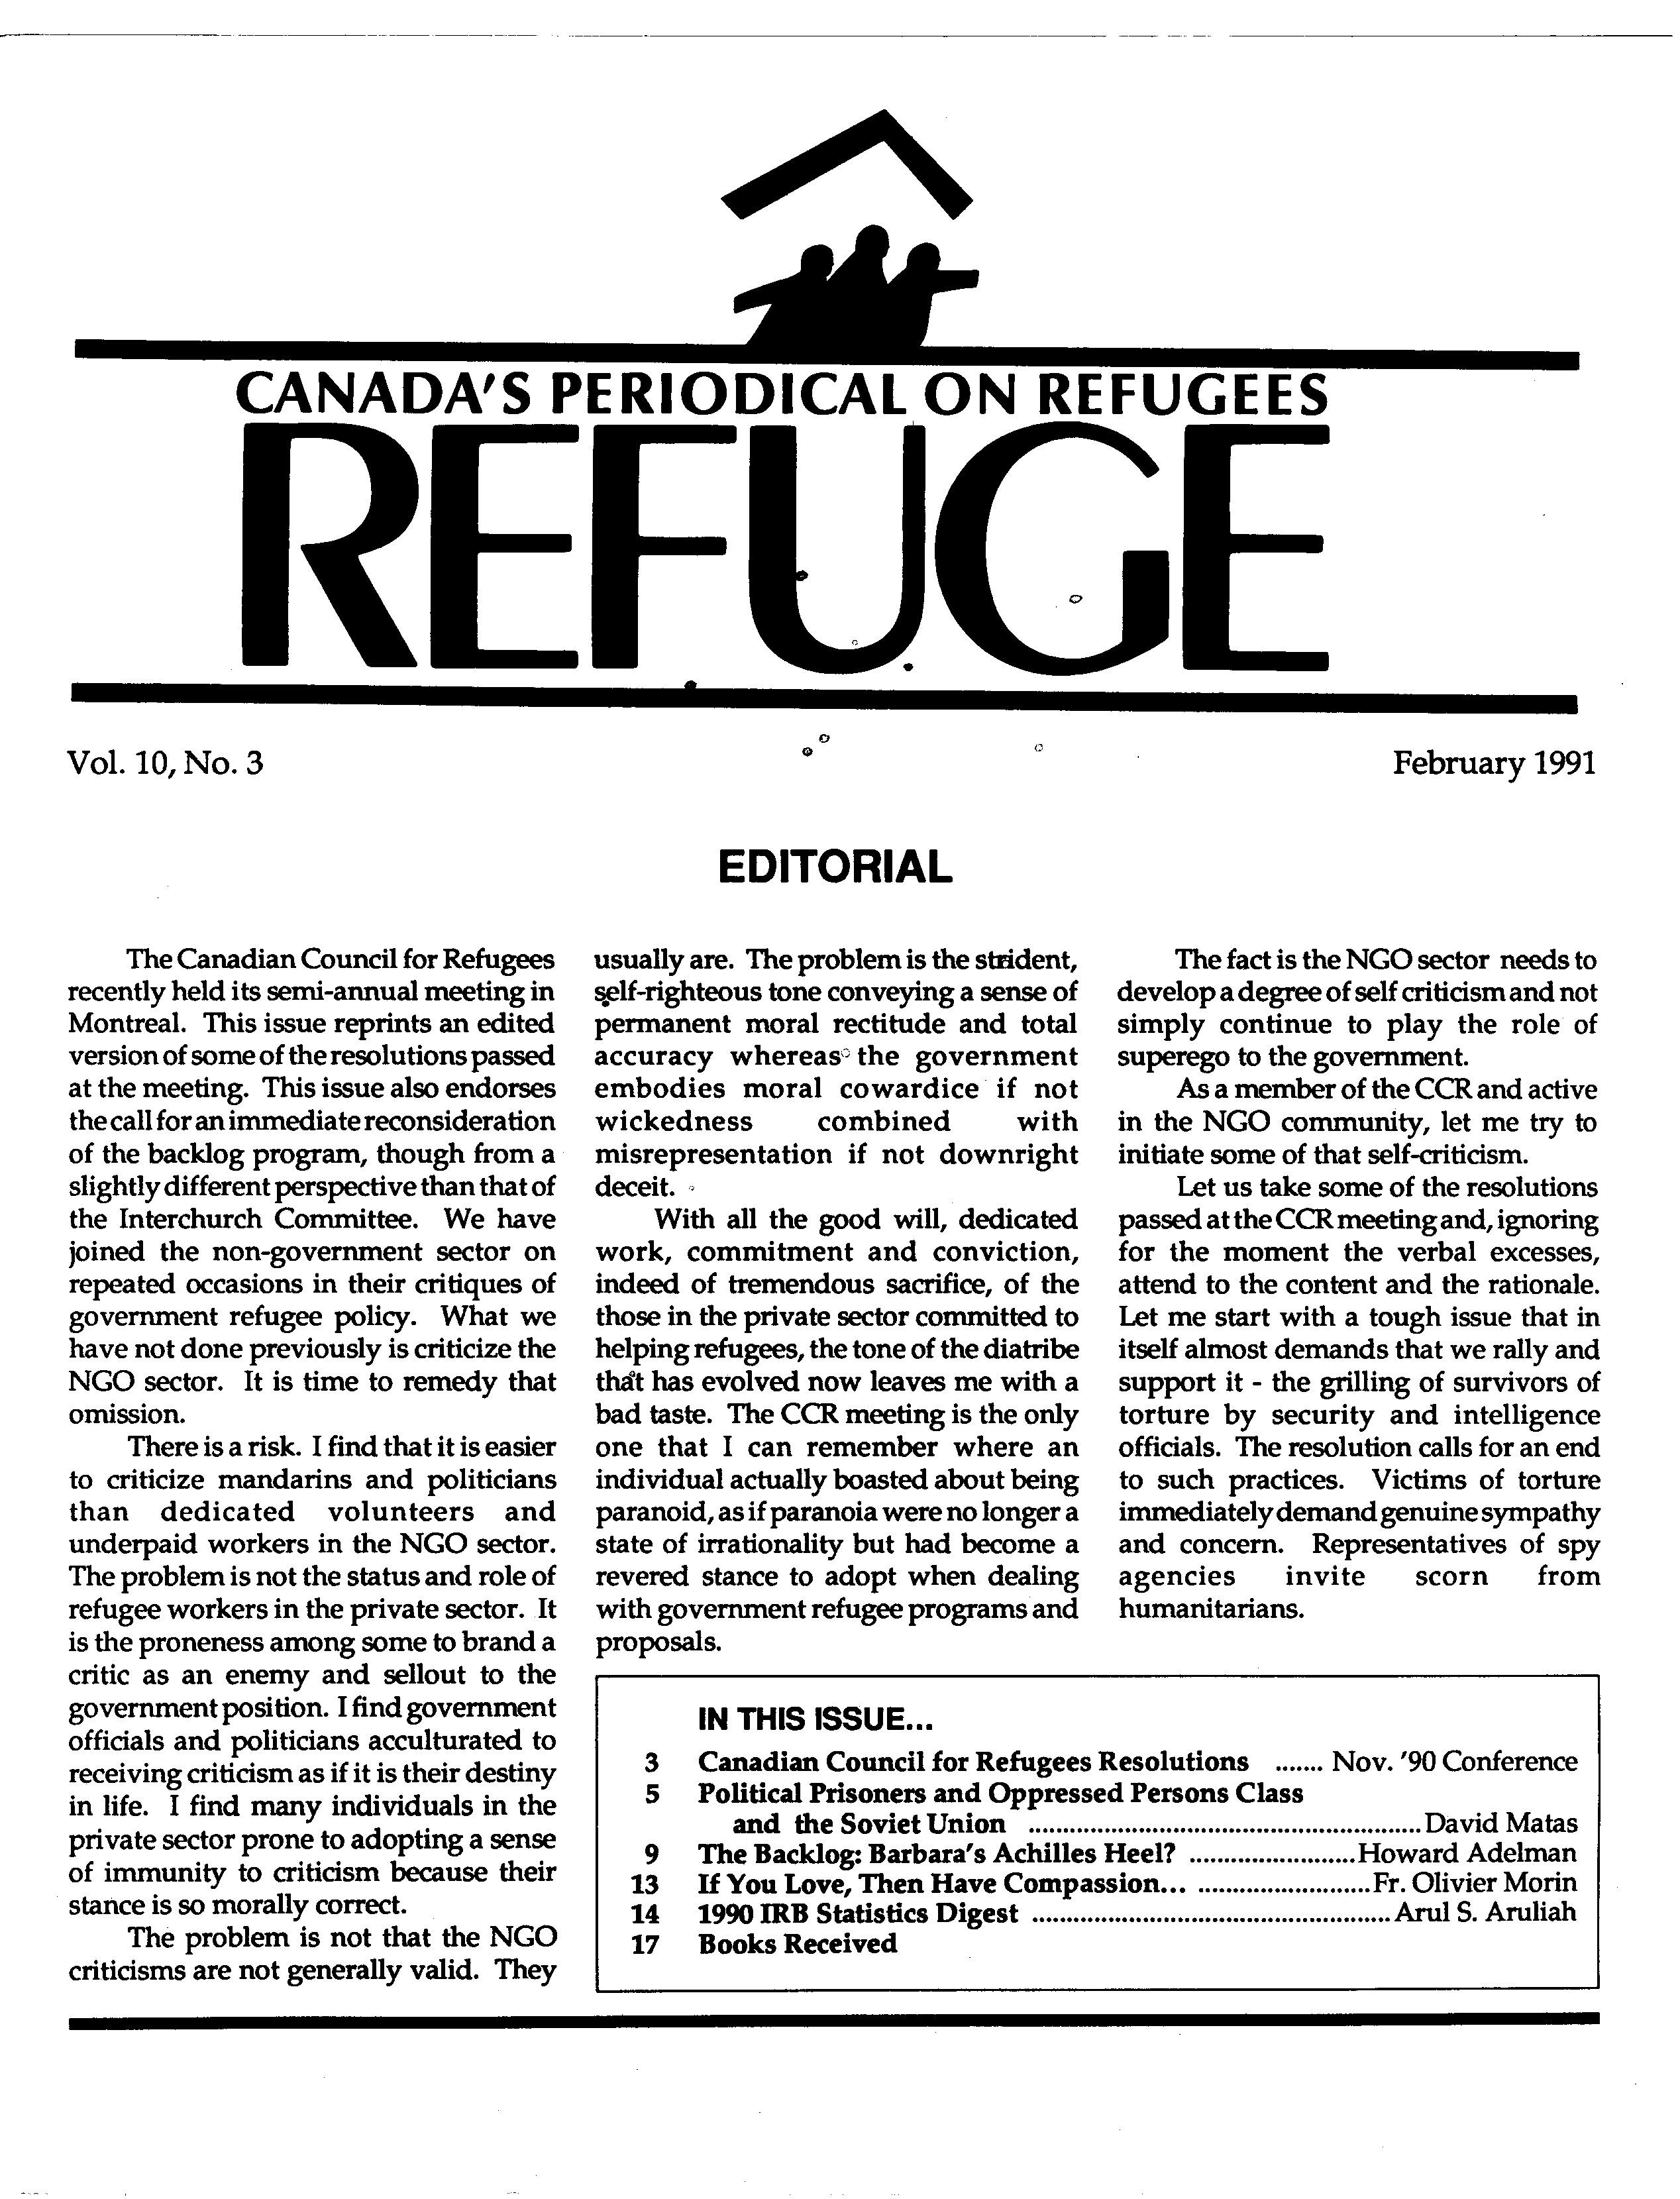 first page Refuge vol. 10.3 1991